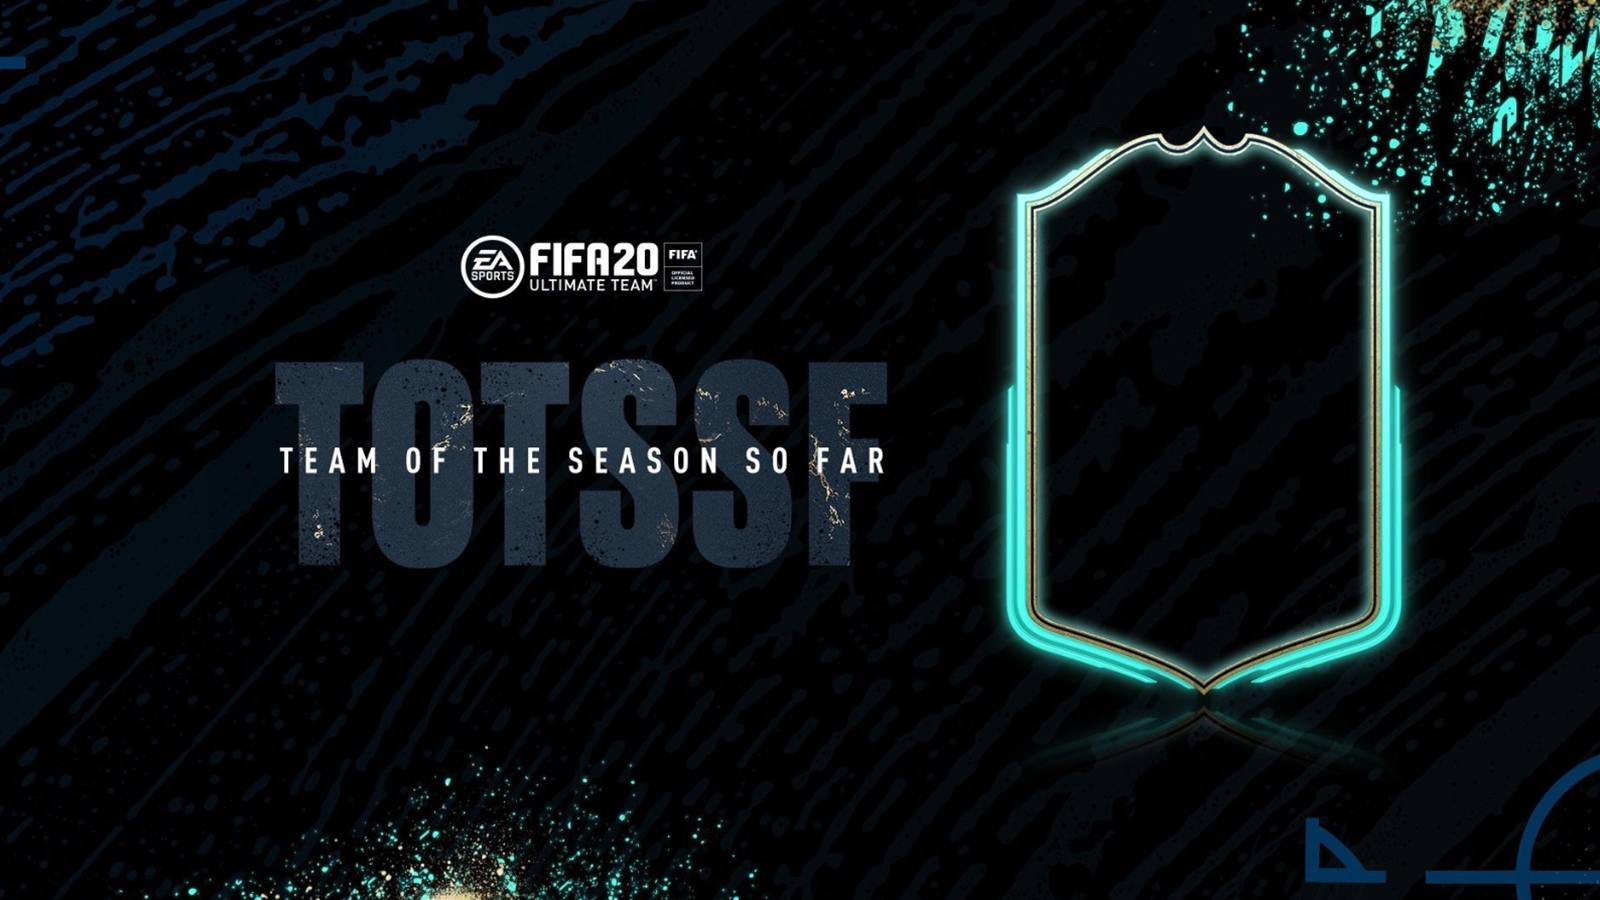 Evenement Team Of The Season So Far (TOTSSF) sur FIFA 20